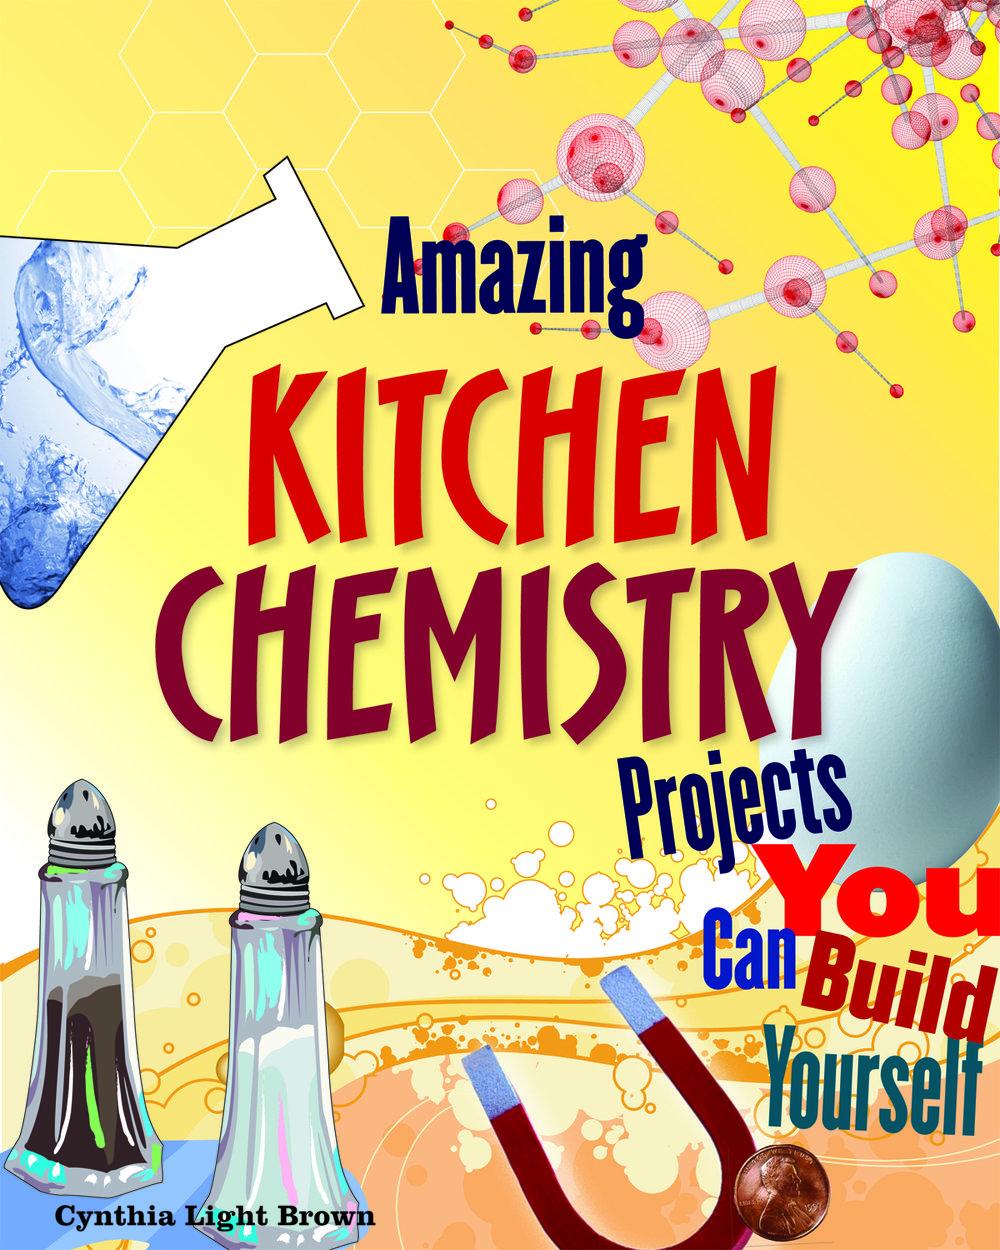 KitchenChemistry_Color.jpg